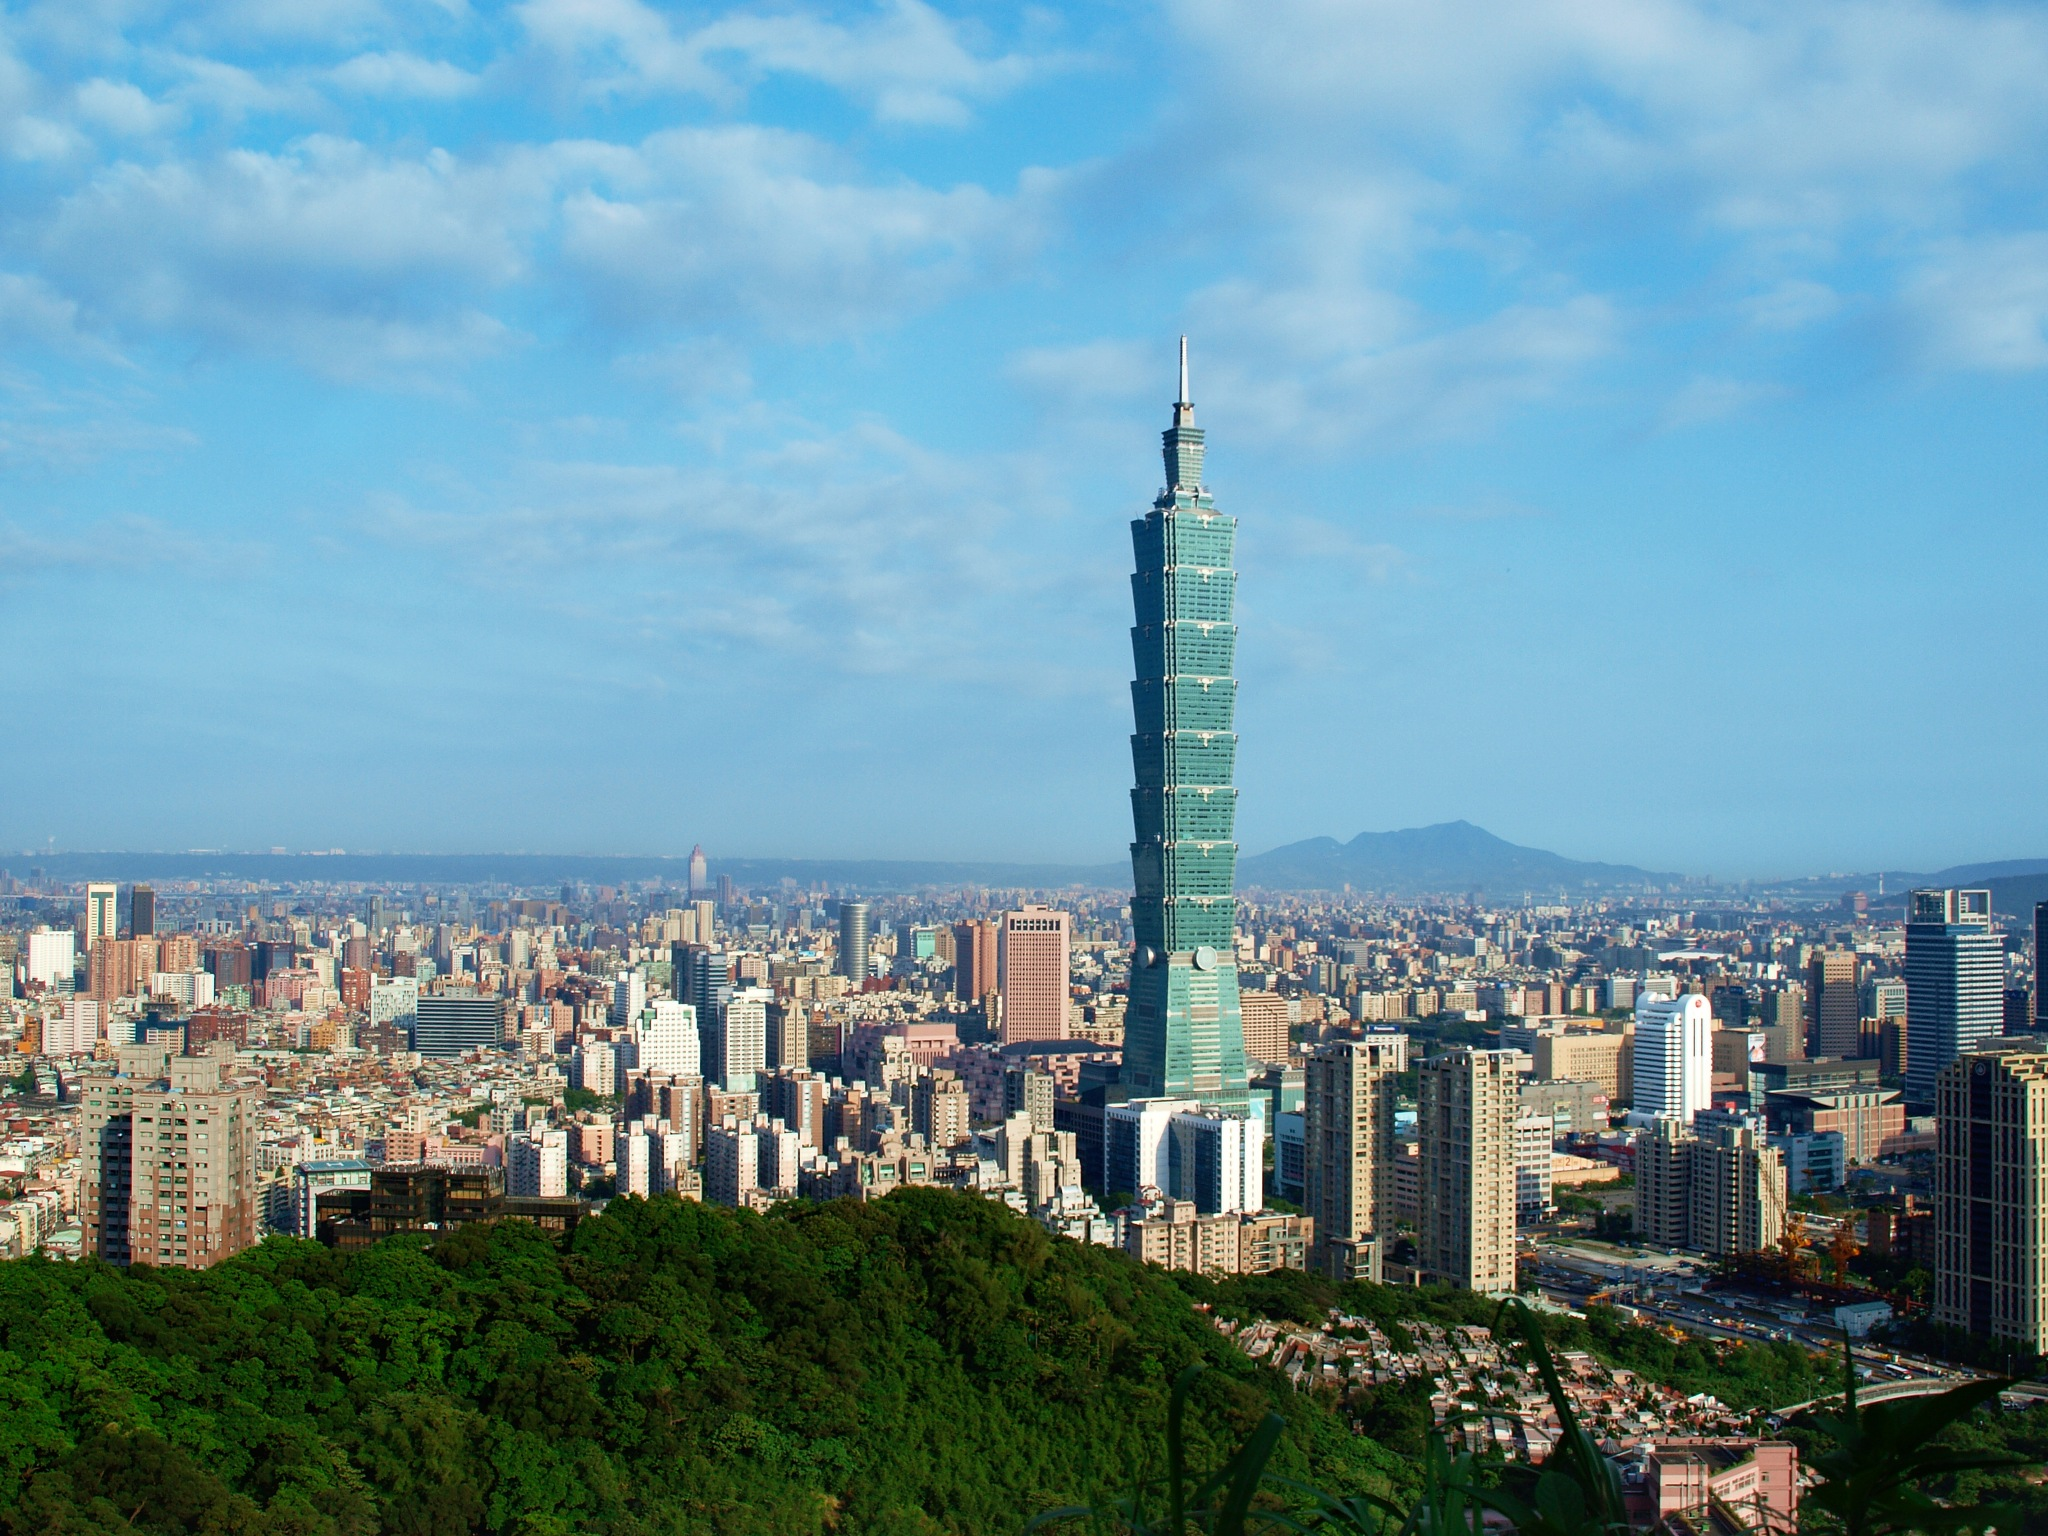 Taipei Basin Aerial by Alix Lee